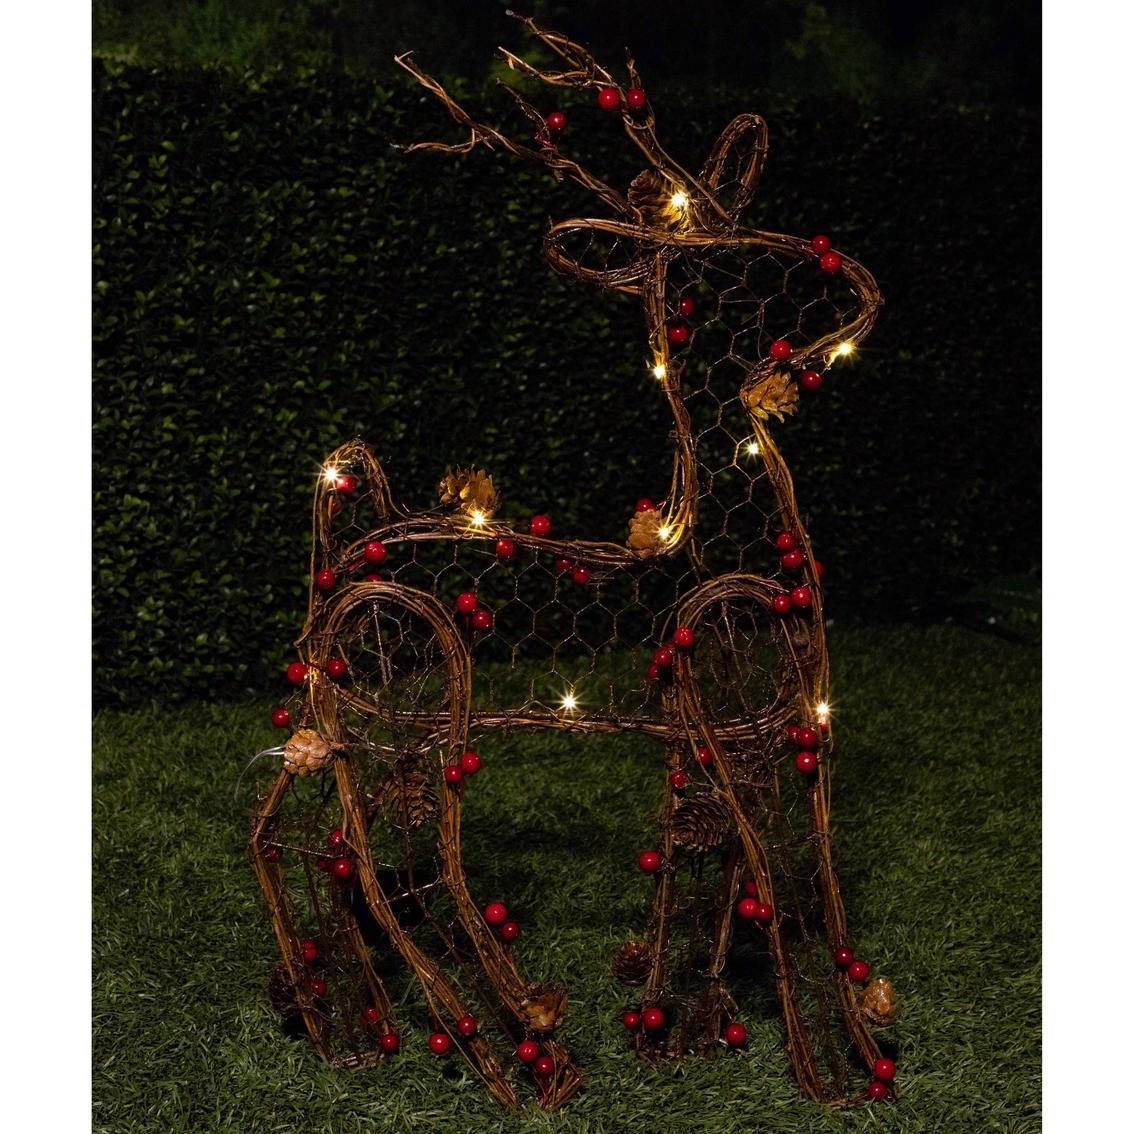 Alpine Rattan Christmas Reindeer Decoration with LED Lights